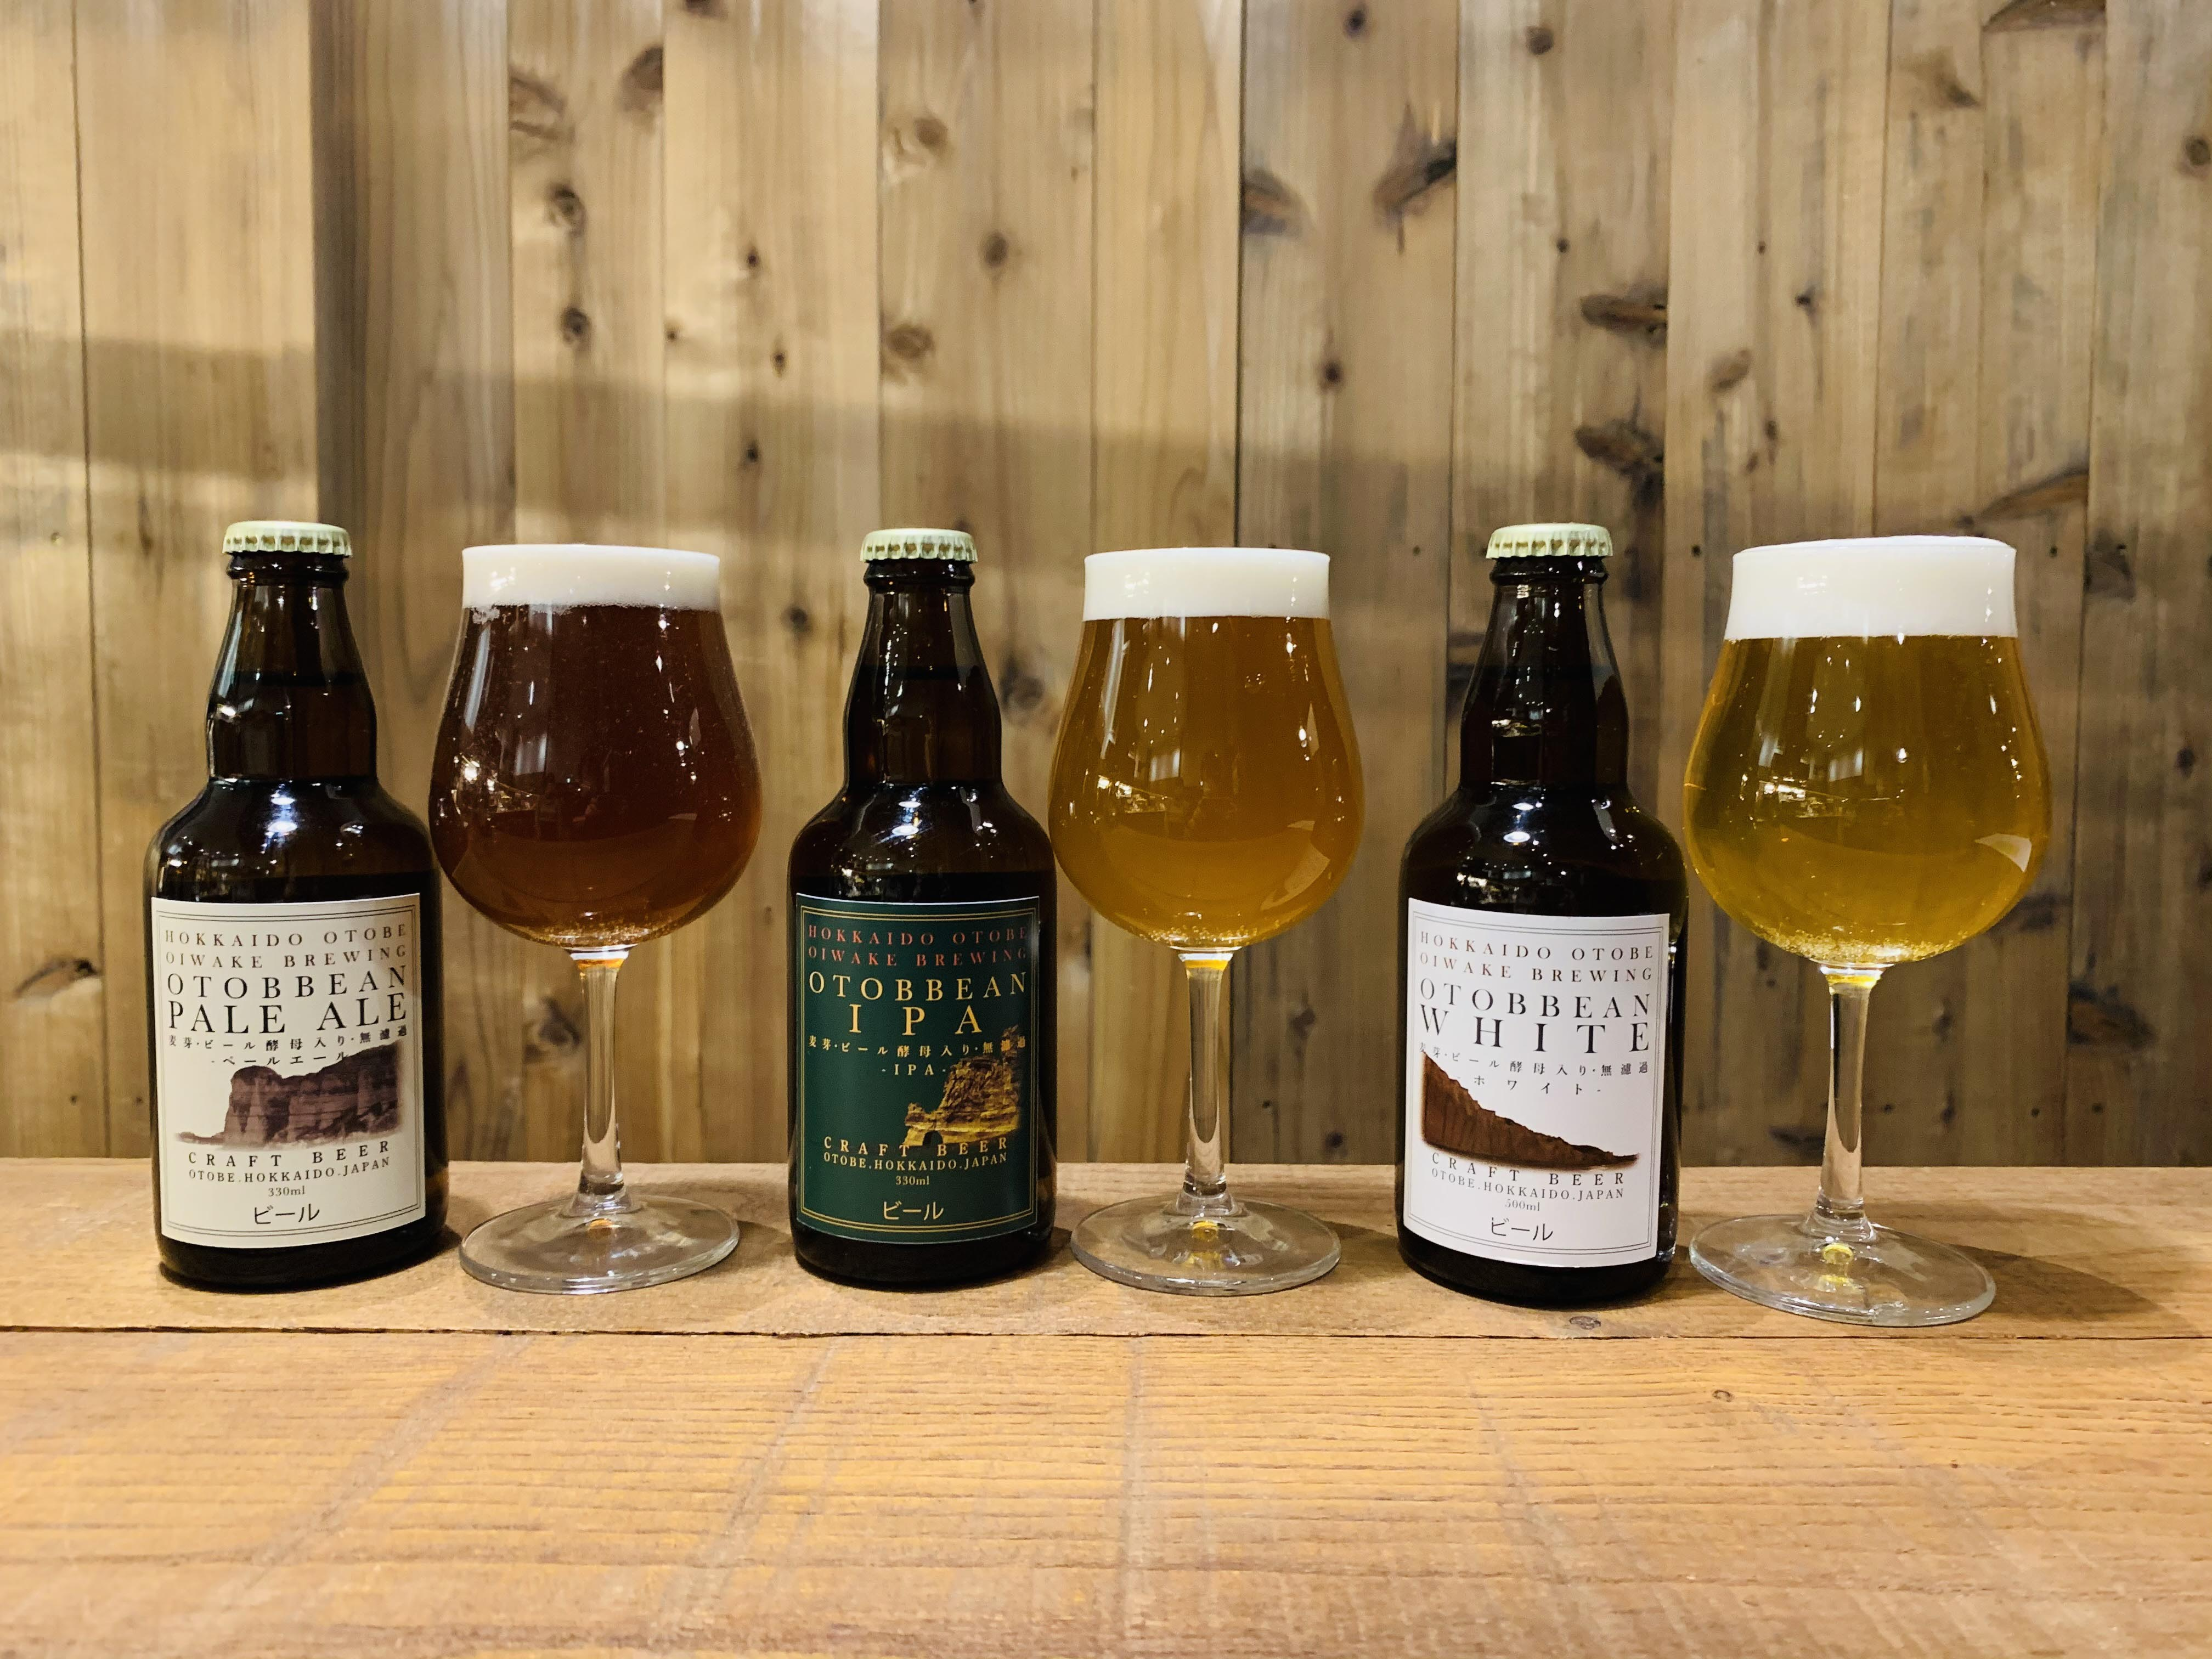 OTOBBEAN クラフトビールイメージ